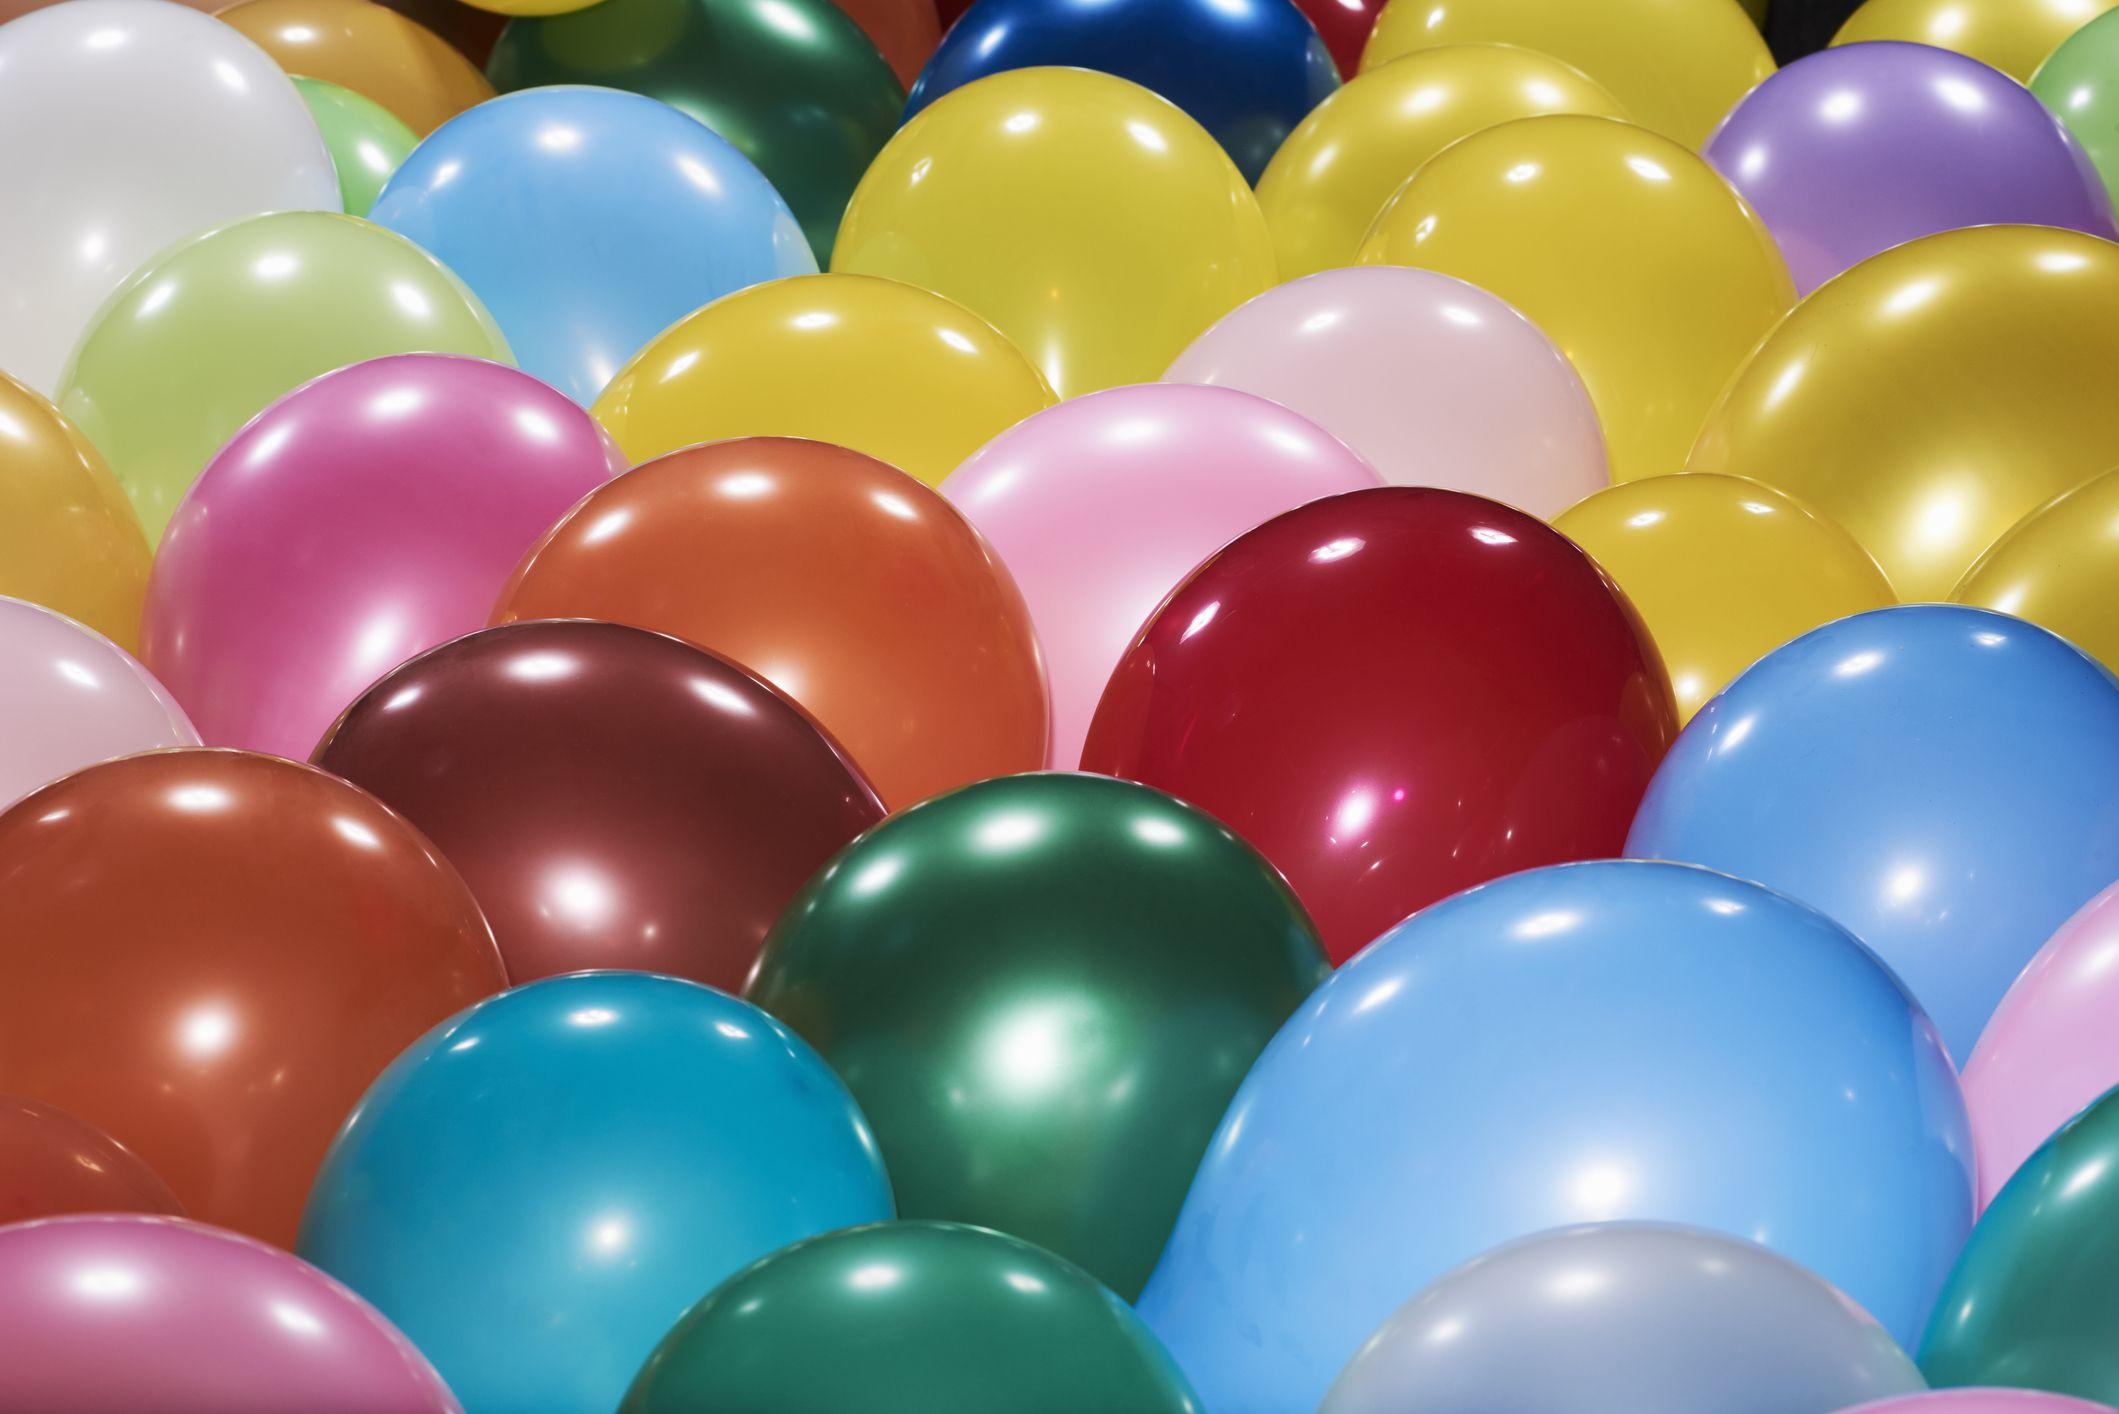 Unhinged Balloon Company